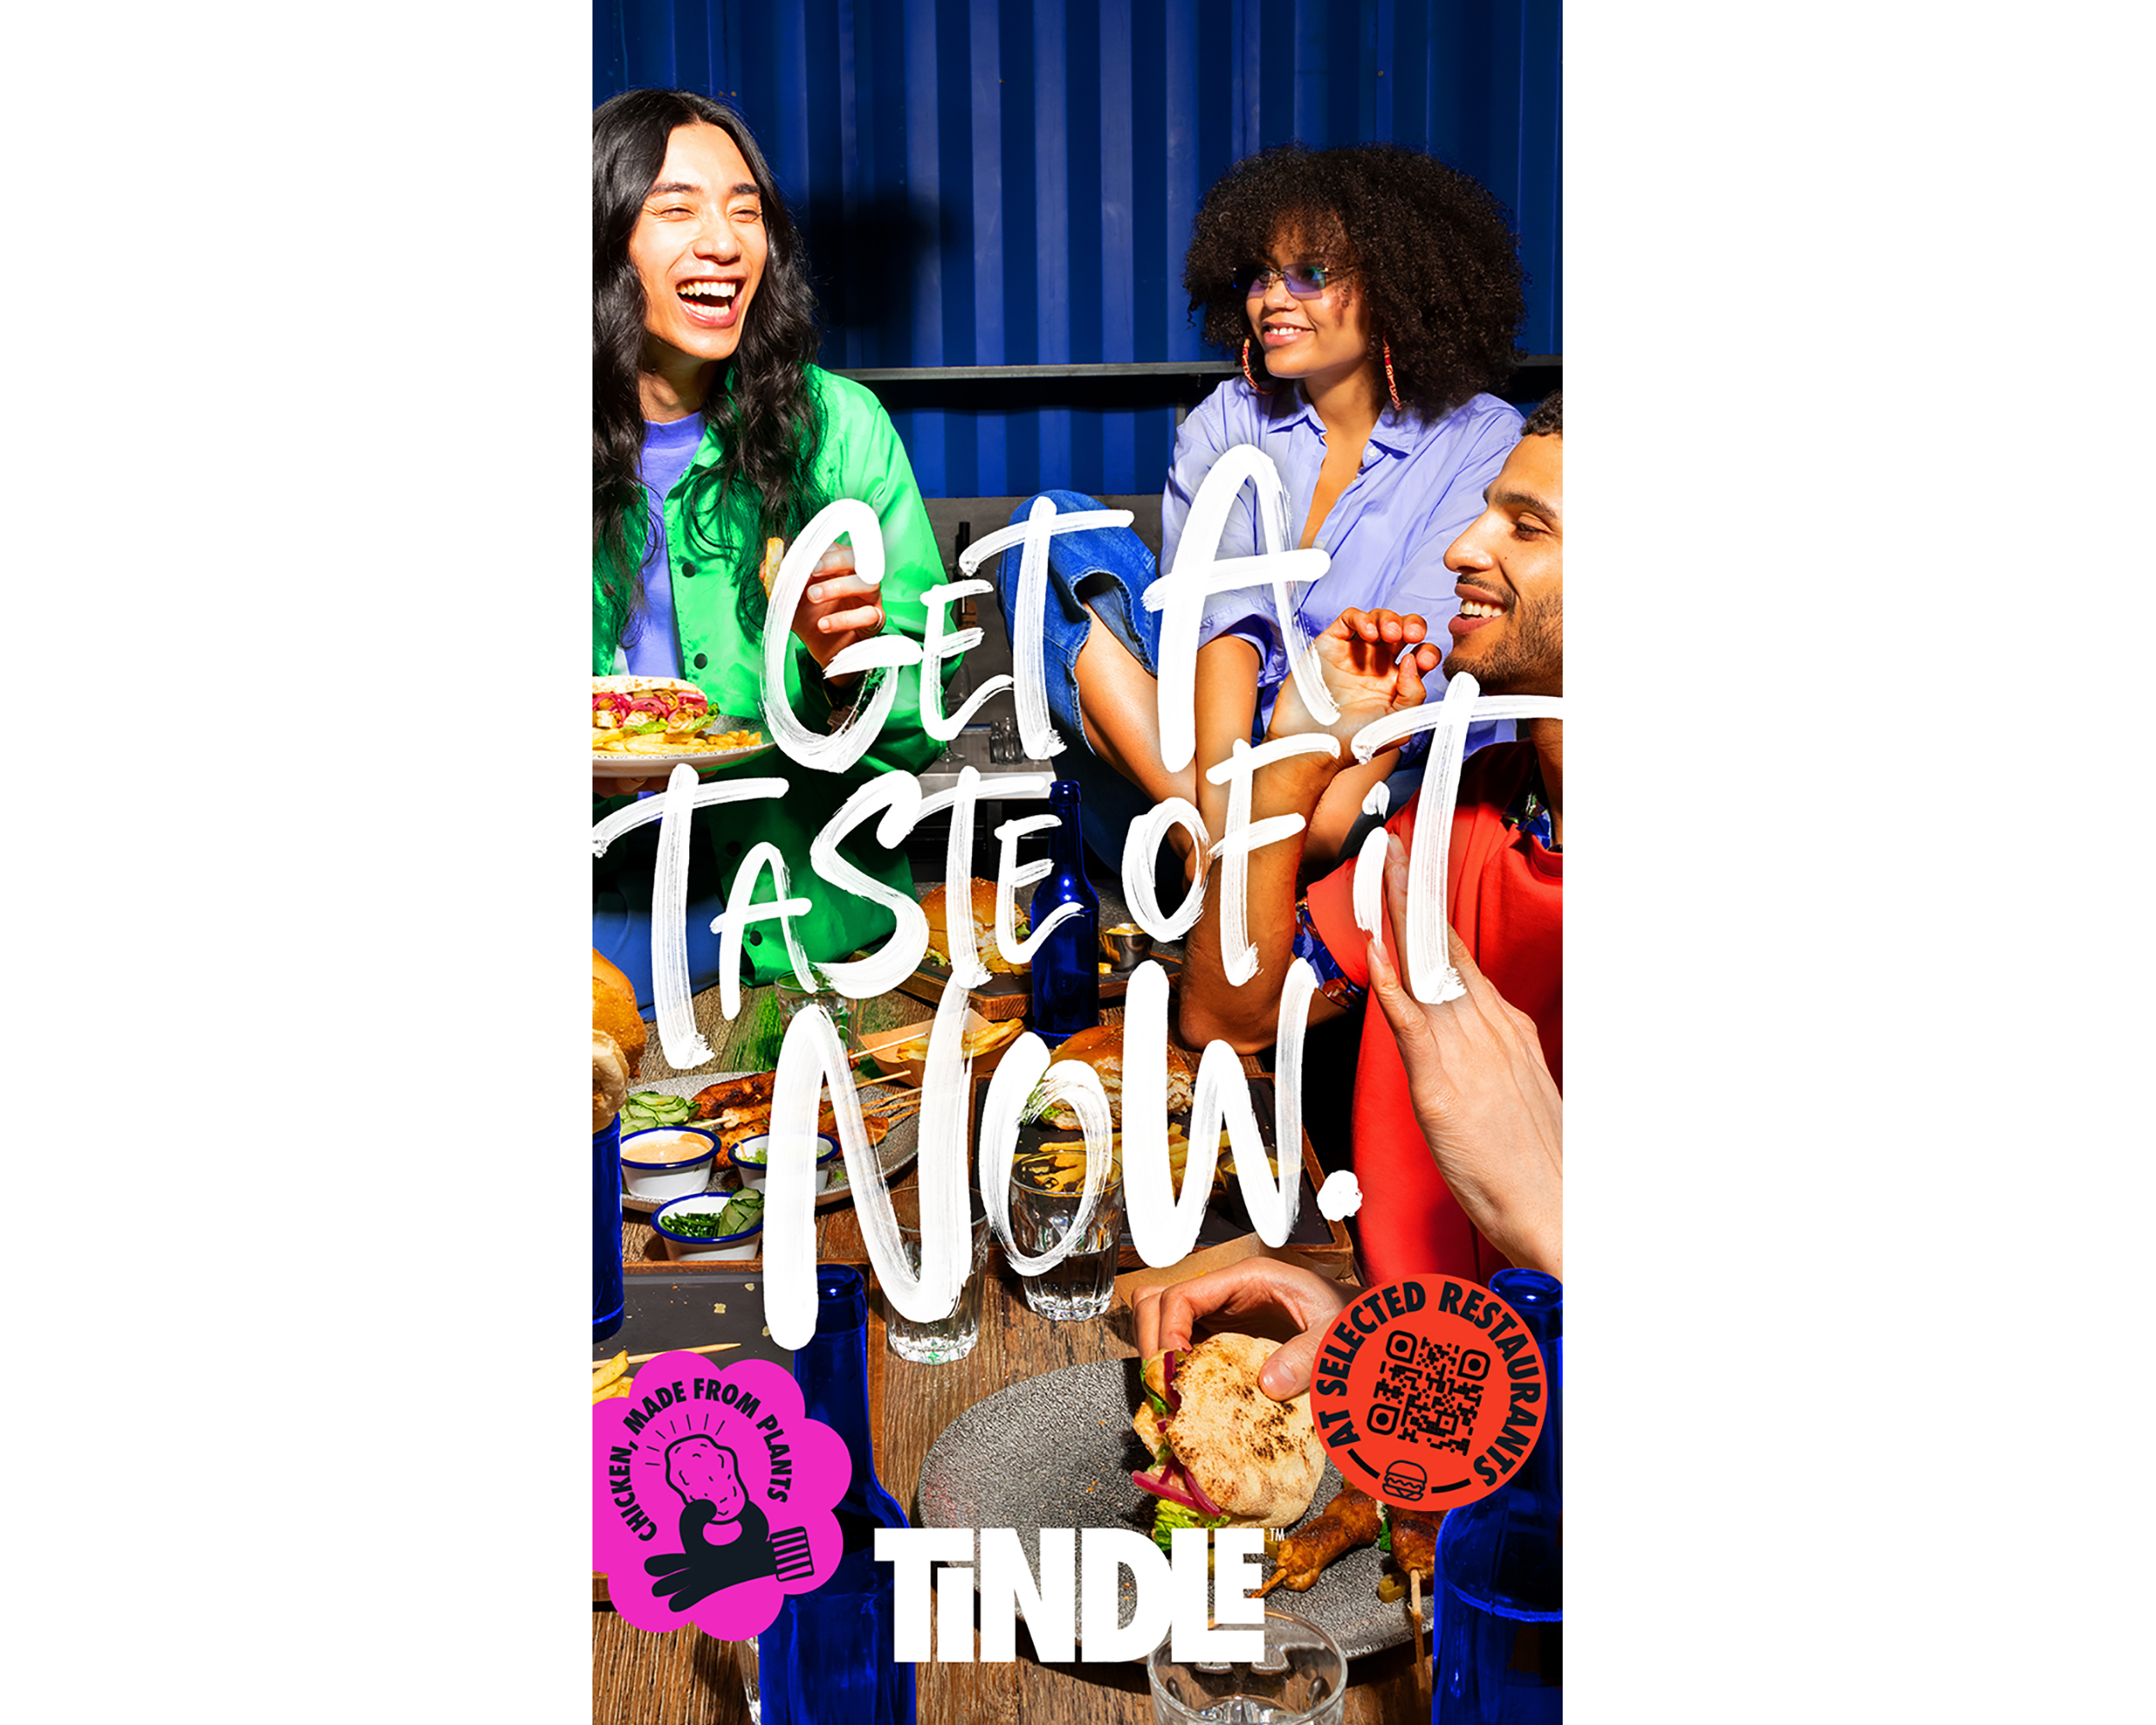 TiNDLE-Poster-5.1-TASTE-NOW